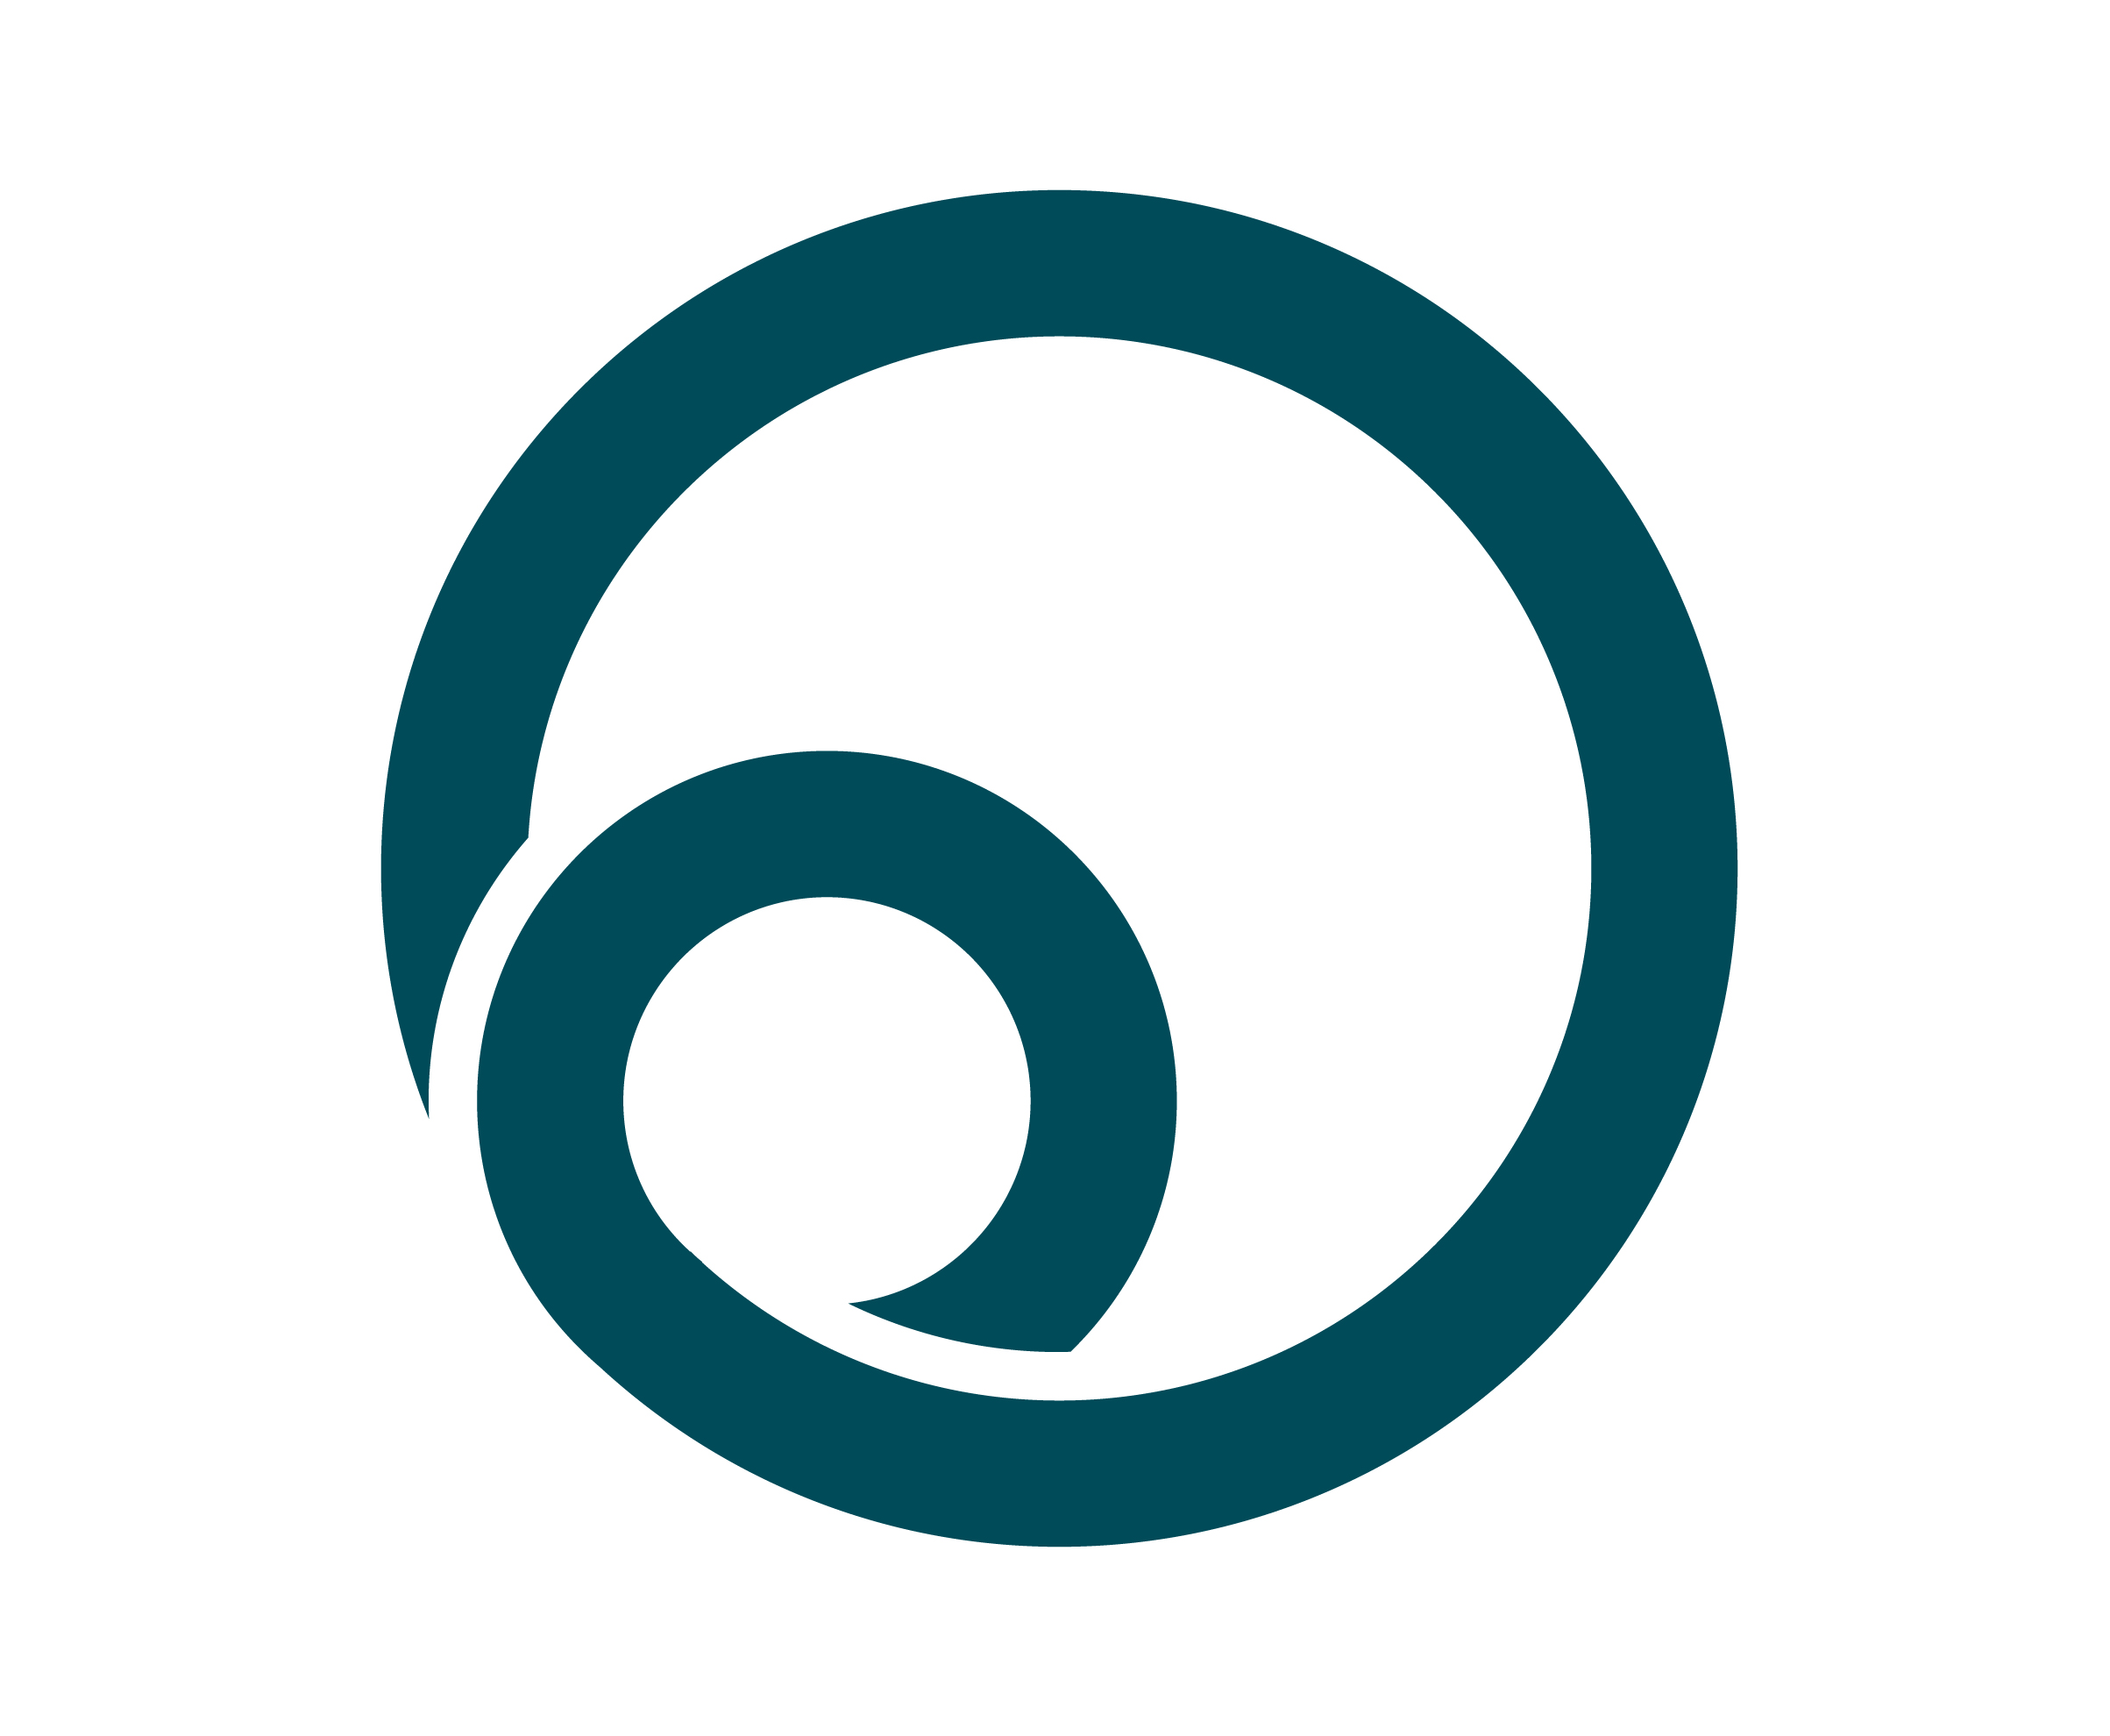 CirculR